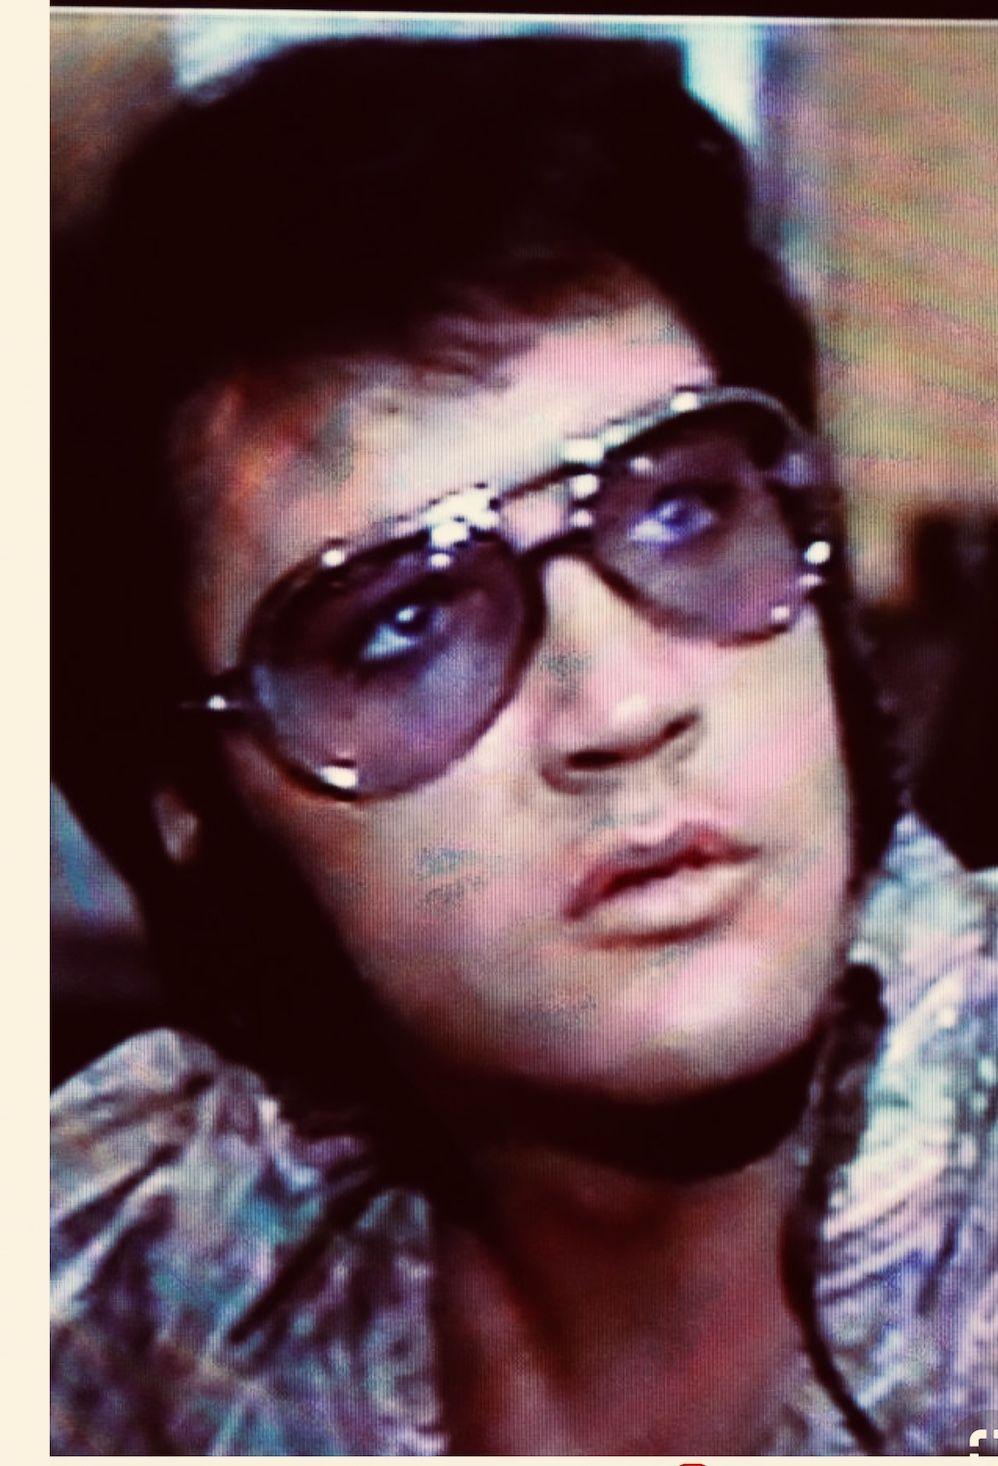 Pin do(a) Anabela Gomes em Elvis Presley   Pinterest   Óculos 13d481491c